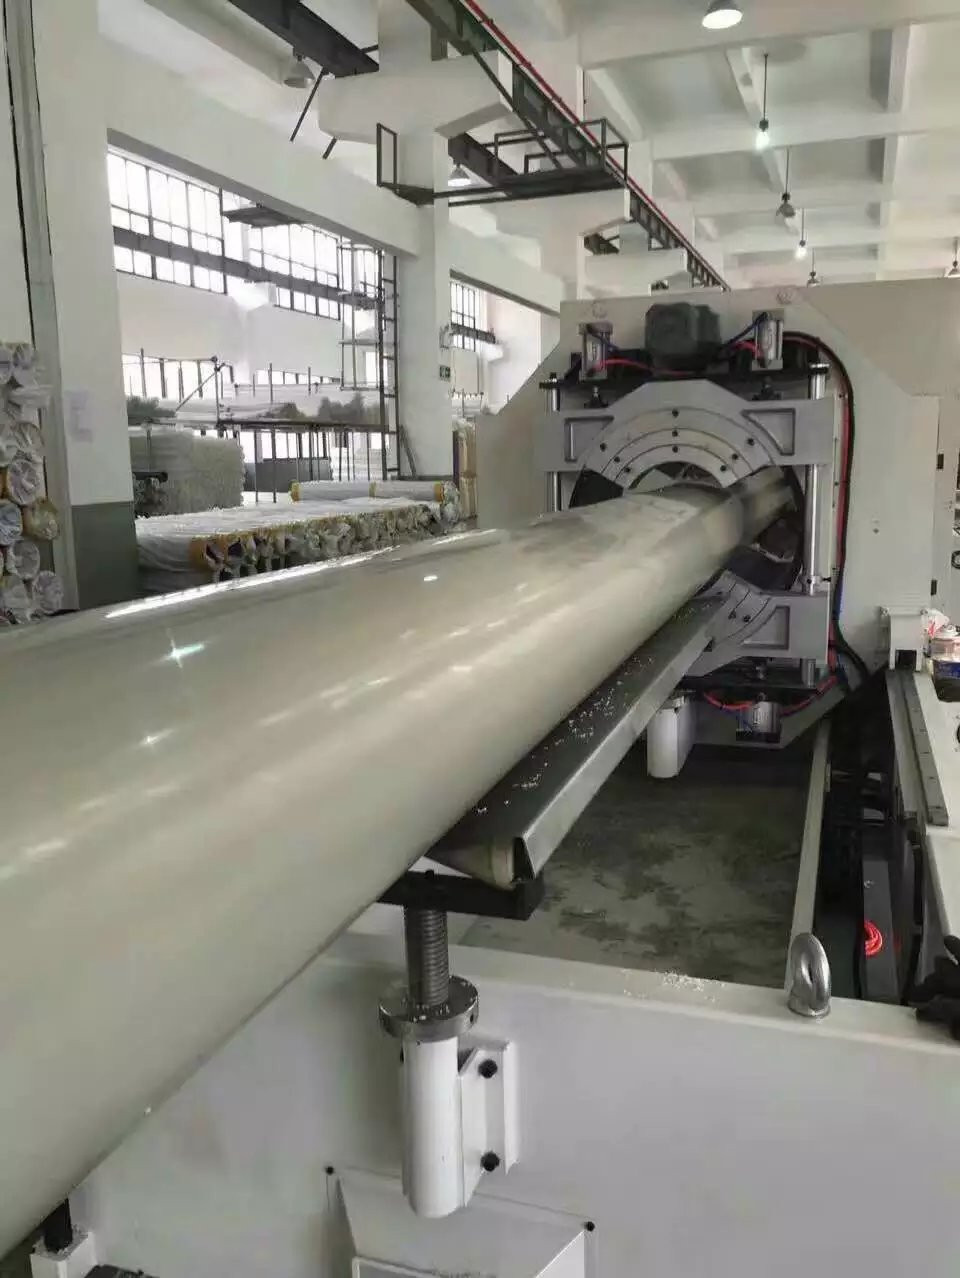 The pipe machine